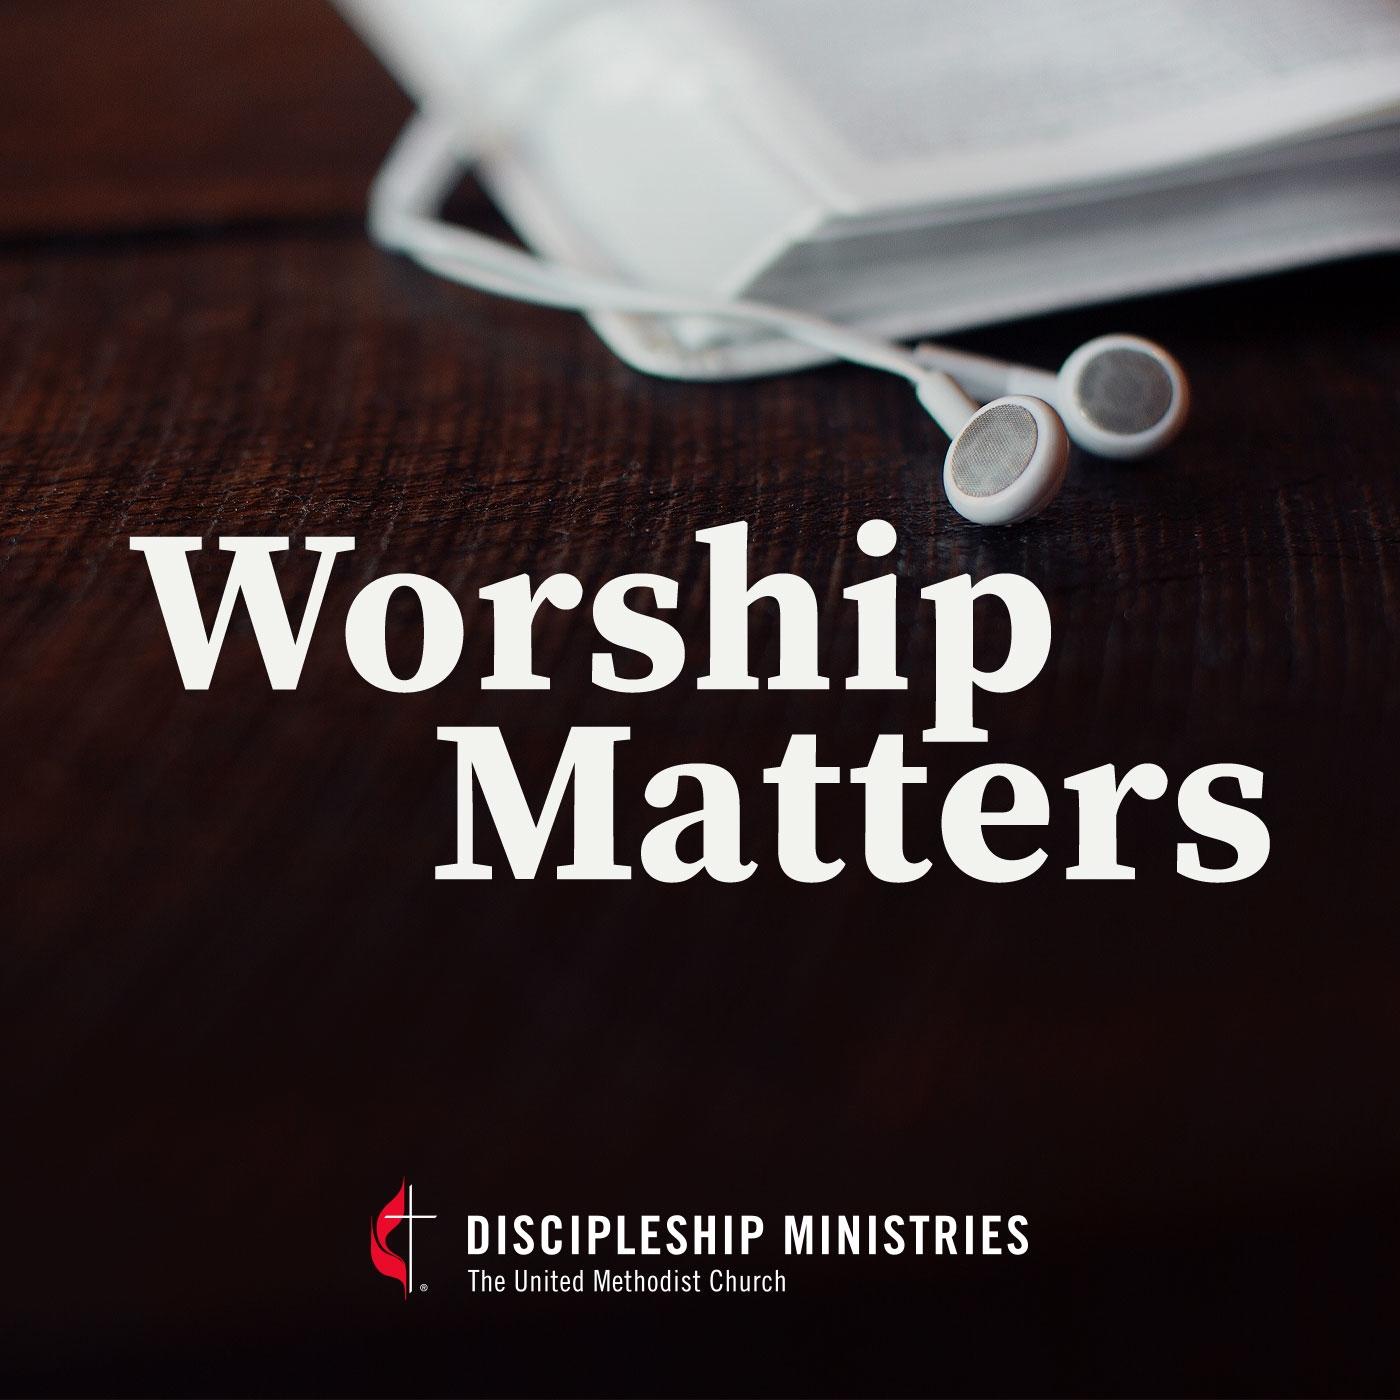 Discipleship Ministries | Worship Matters: Episode 01 - Epiphany  Liturgical Lectionary Umc 2020